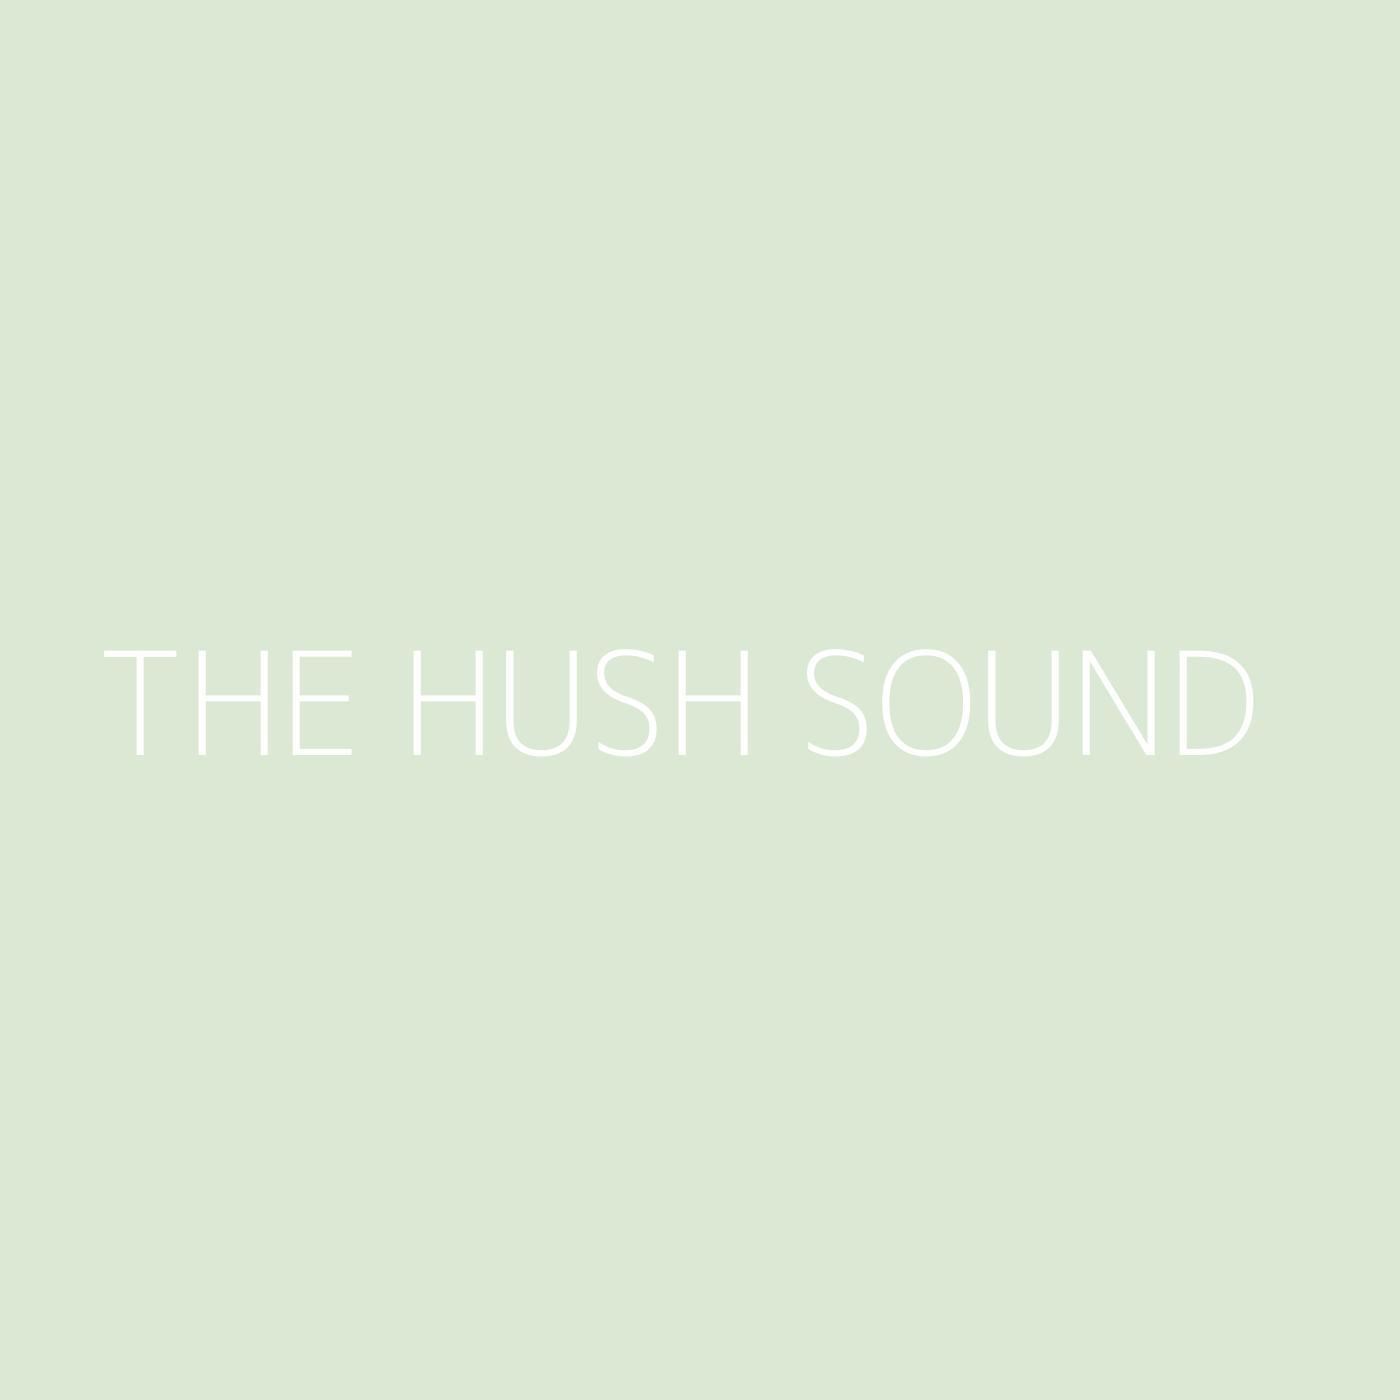 The Hush Sound Playlist Artwork